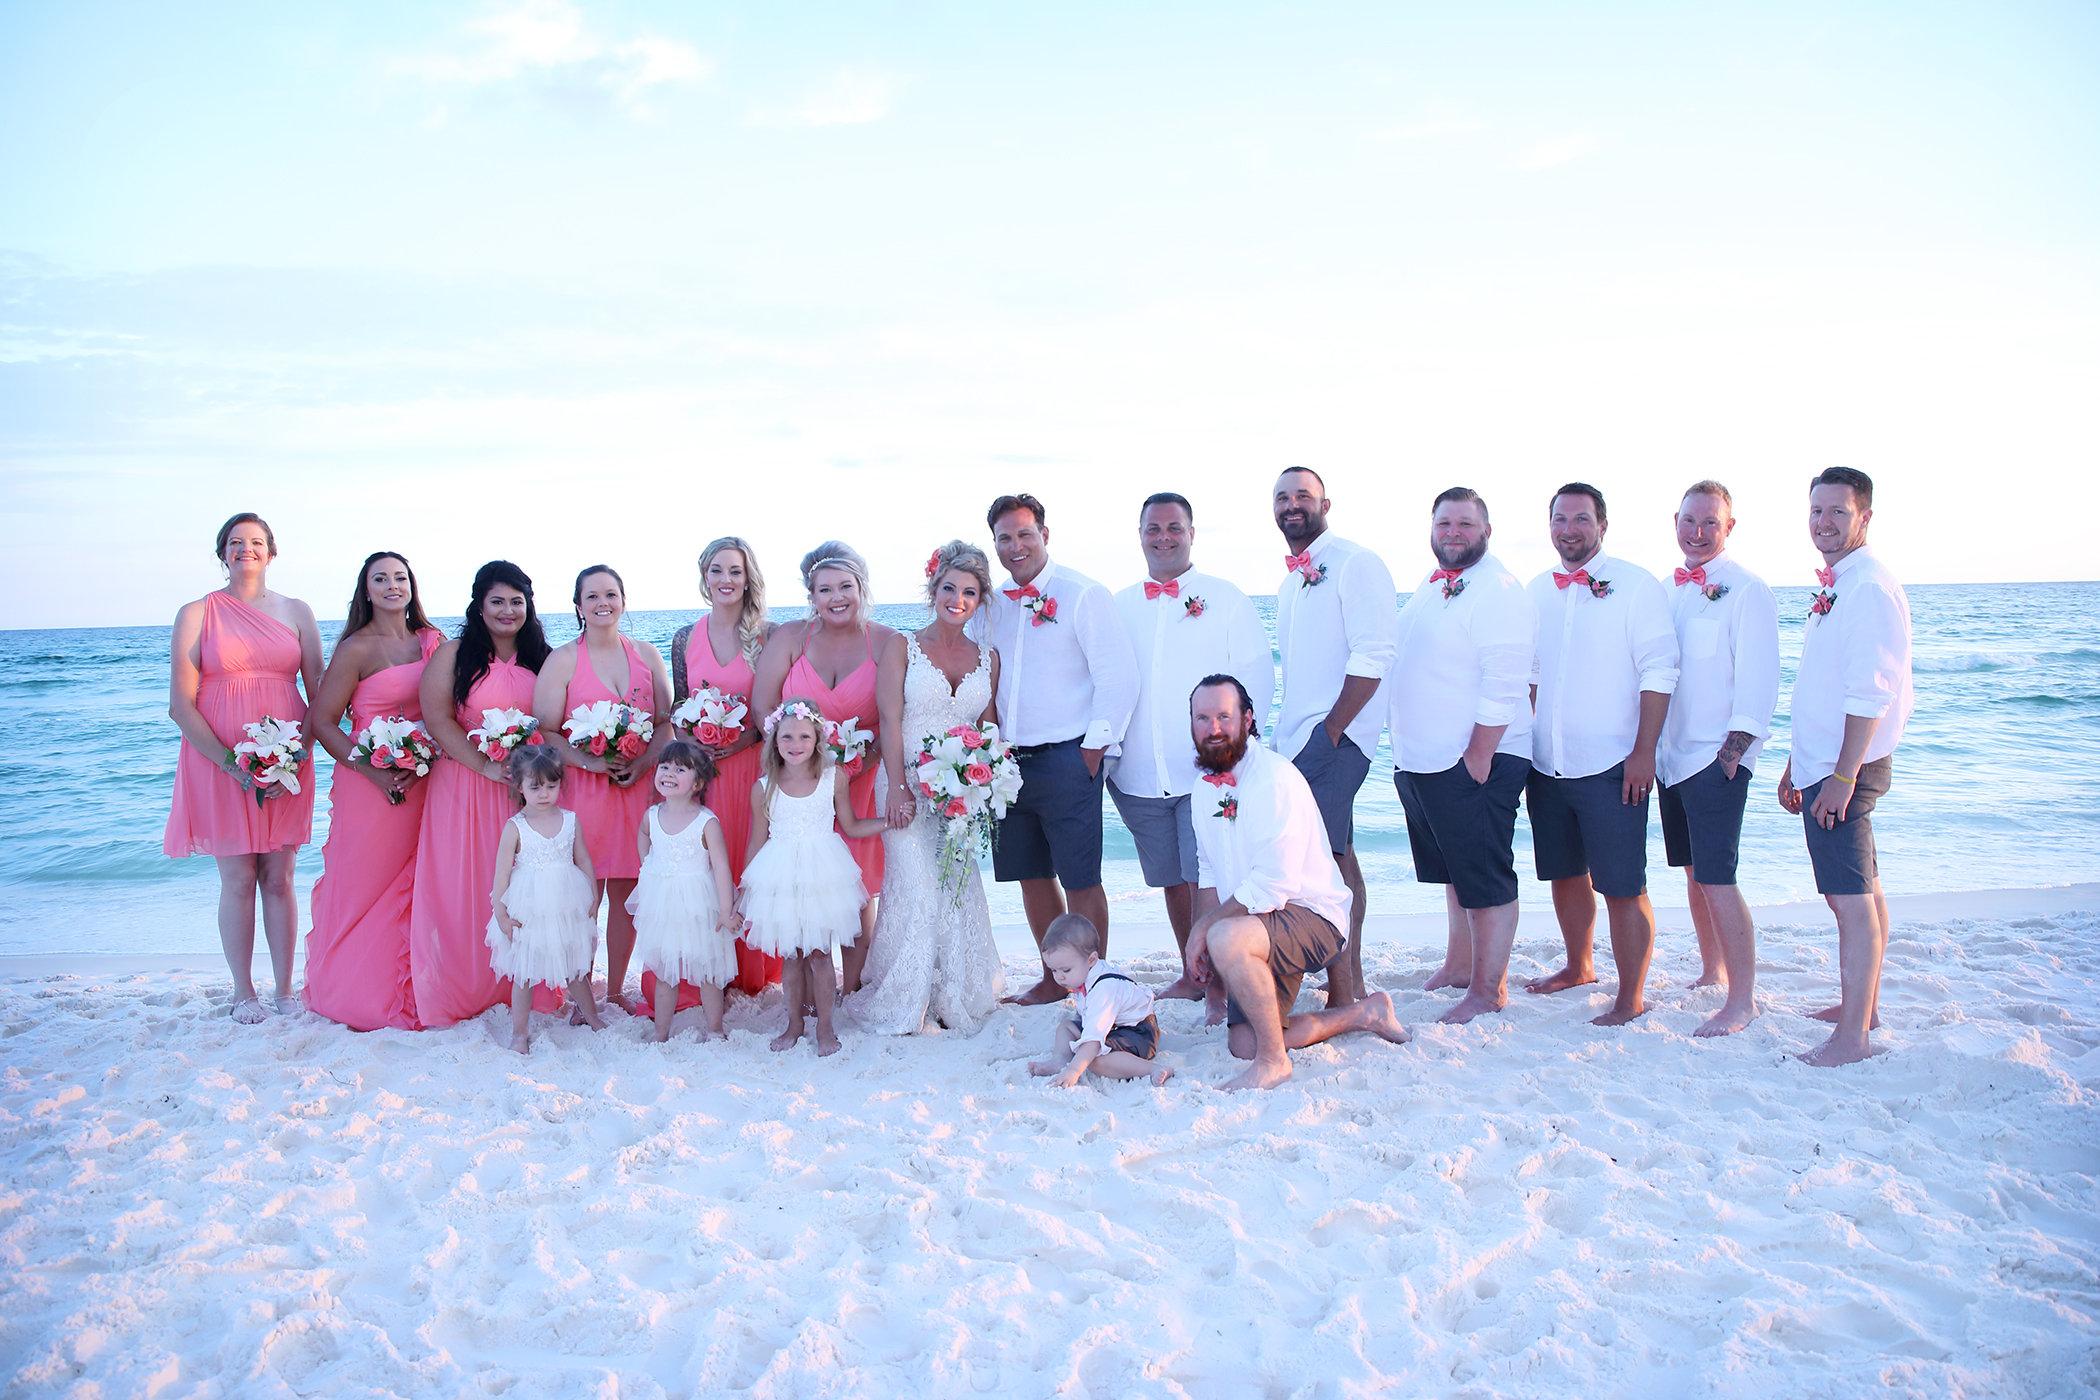 Wedding Services - Image by Angela Frances Photography (francesphotography.com)